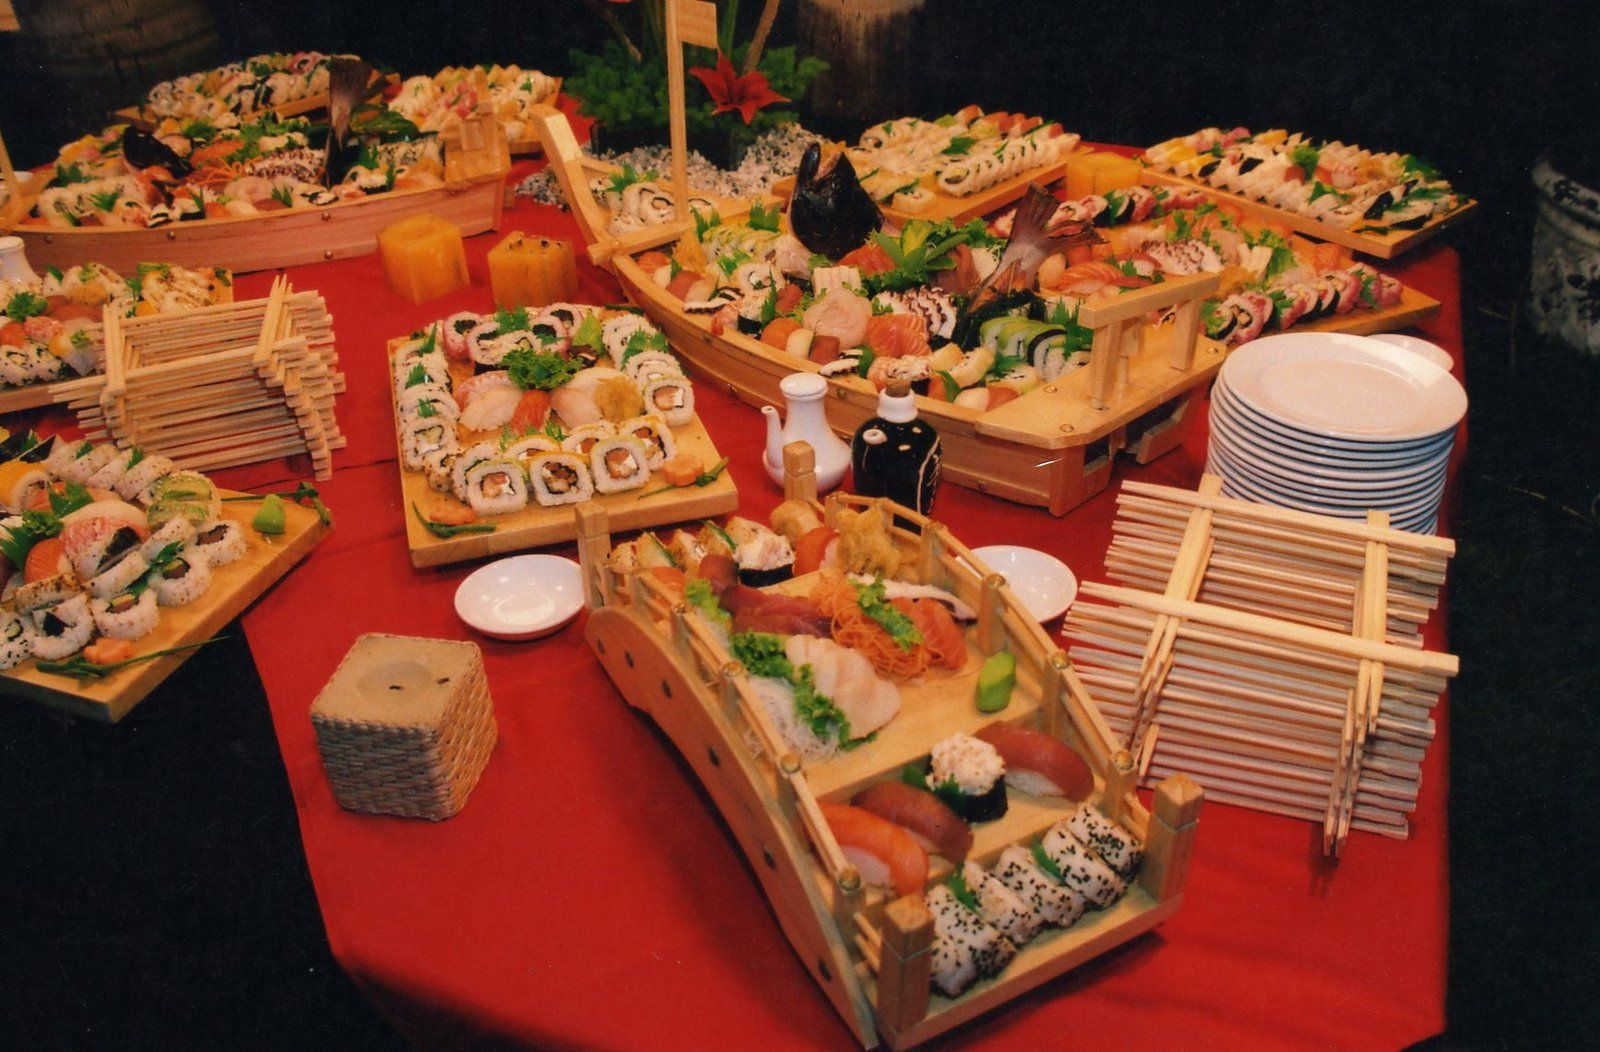 Danitza pavlich catering mesa japonesa comida - Mesas japonesas ...